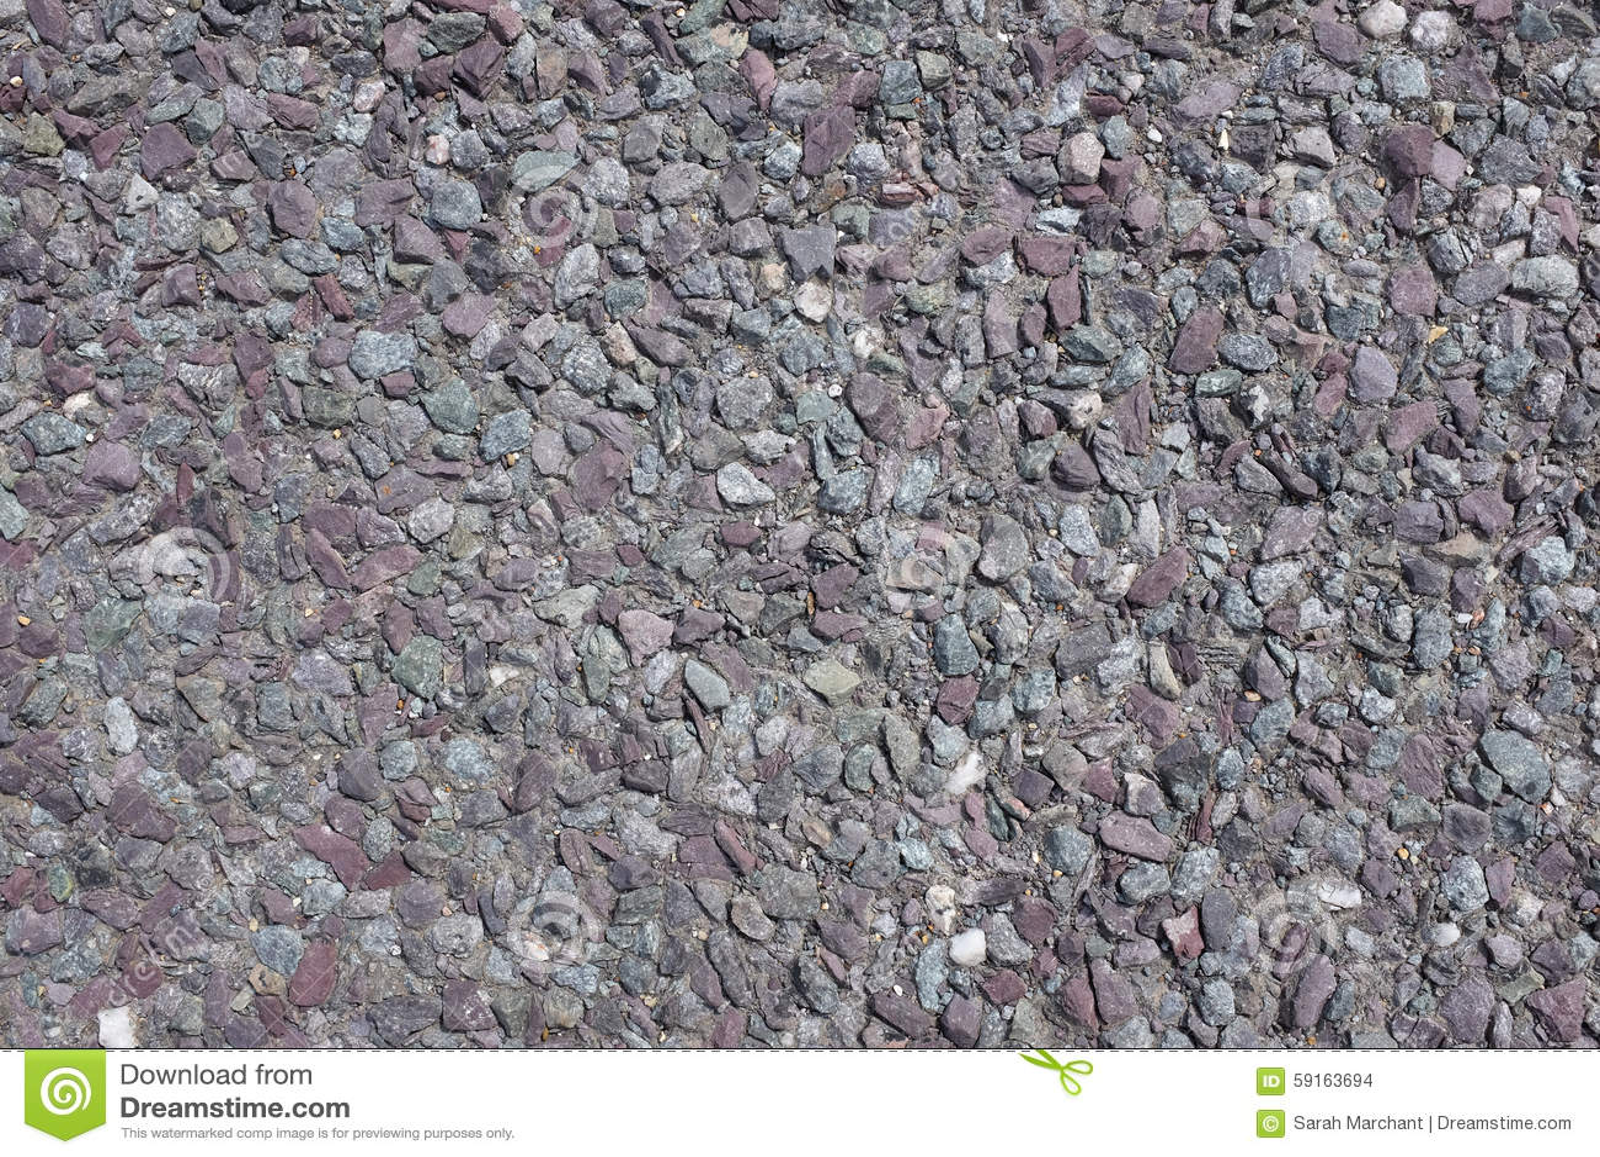 Purple Granite Stone : Granite road stone background stock photo image of path